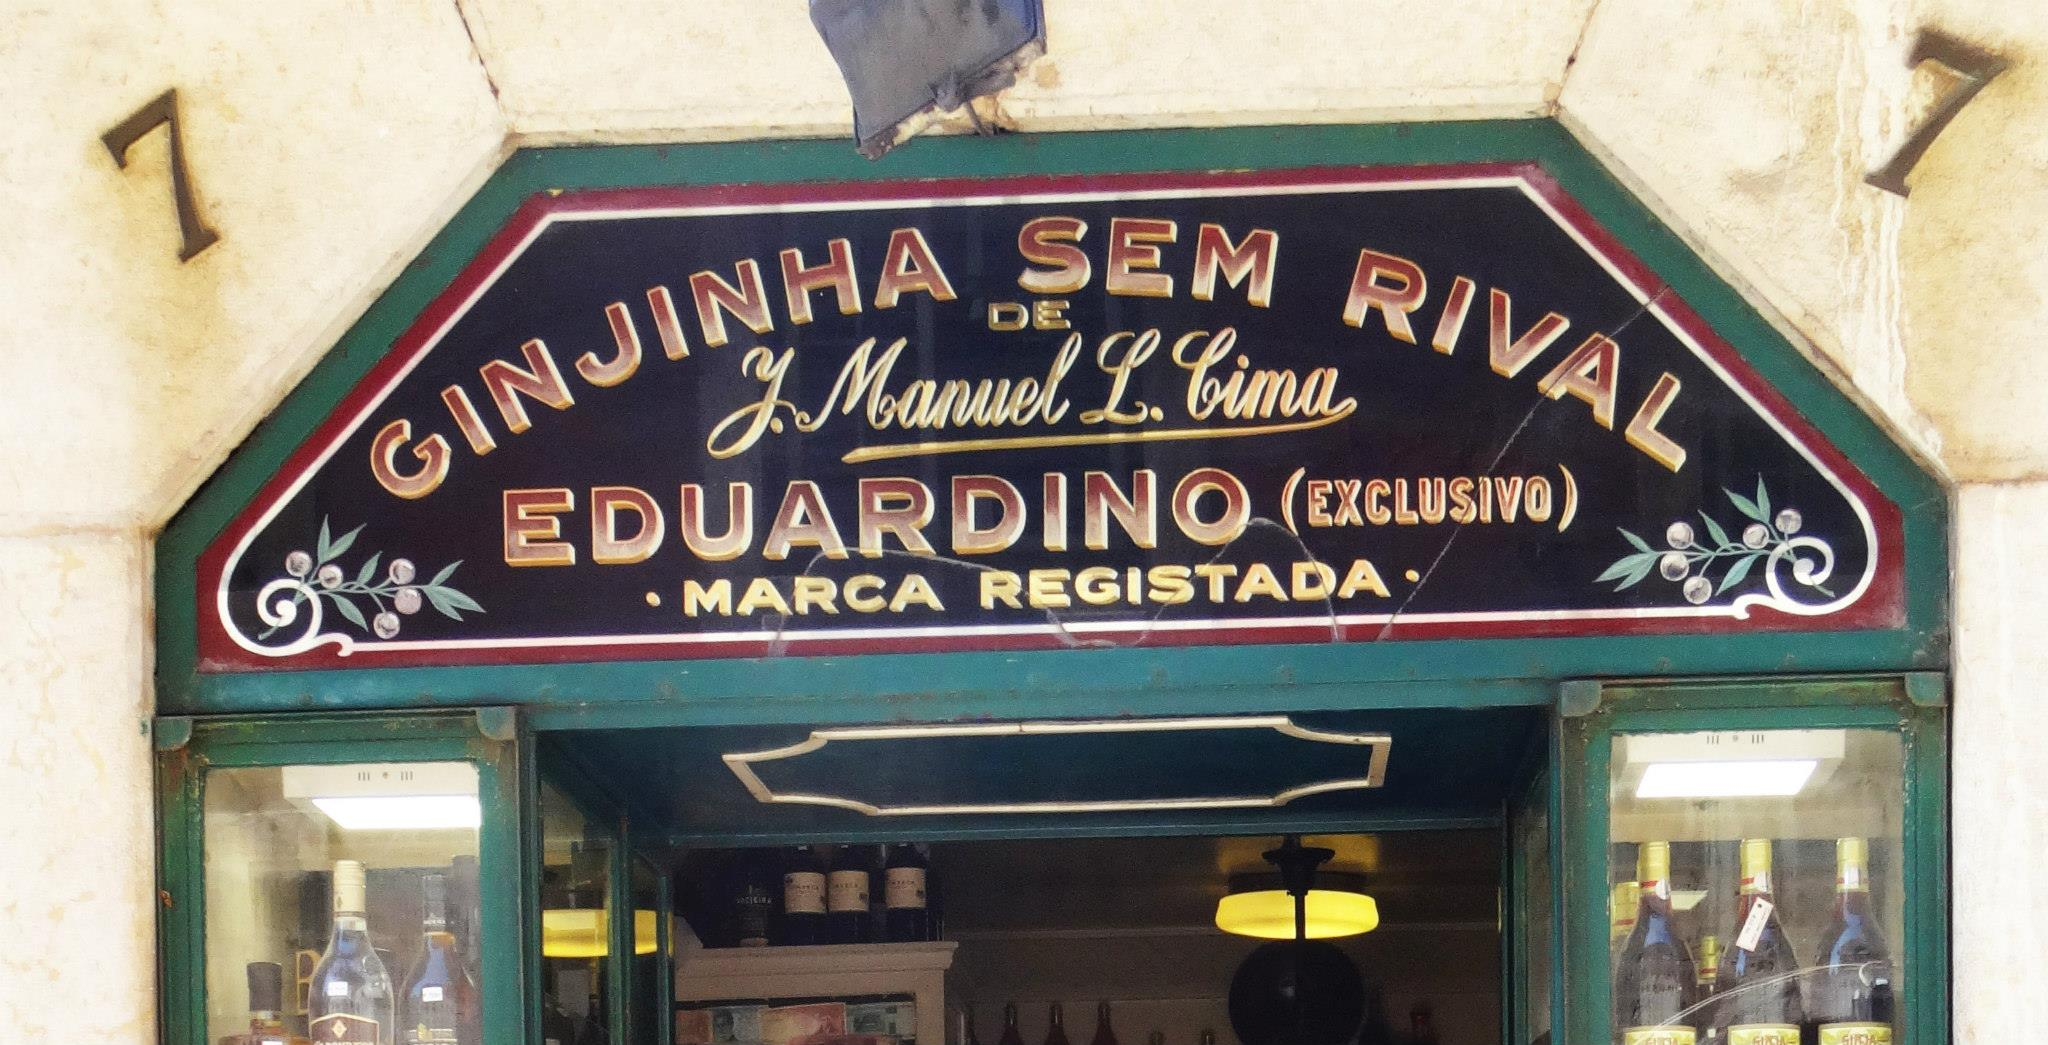 Ginjinha Sem Rival, esmalte y pan de oro sobre cristal, #lisboa #lisbon #rotulo —